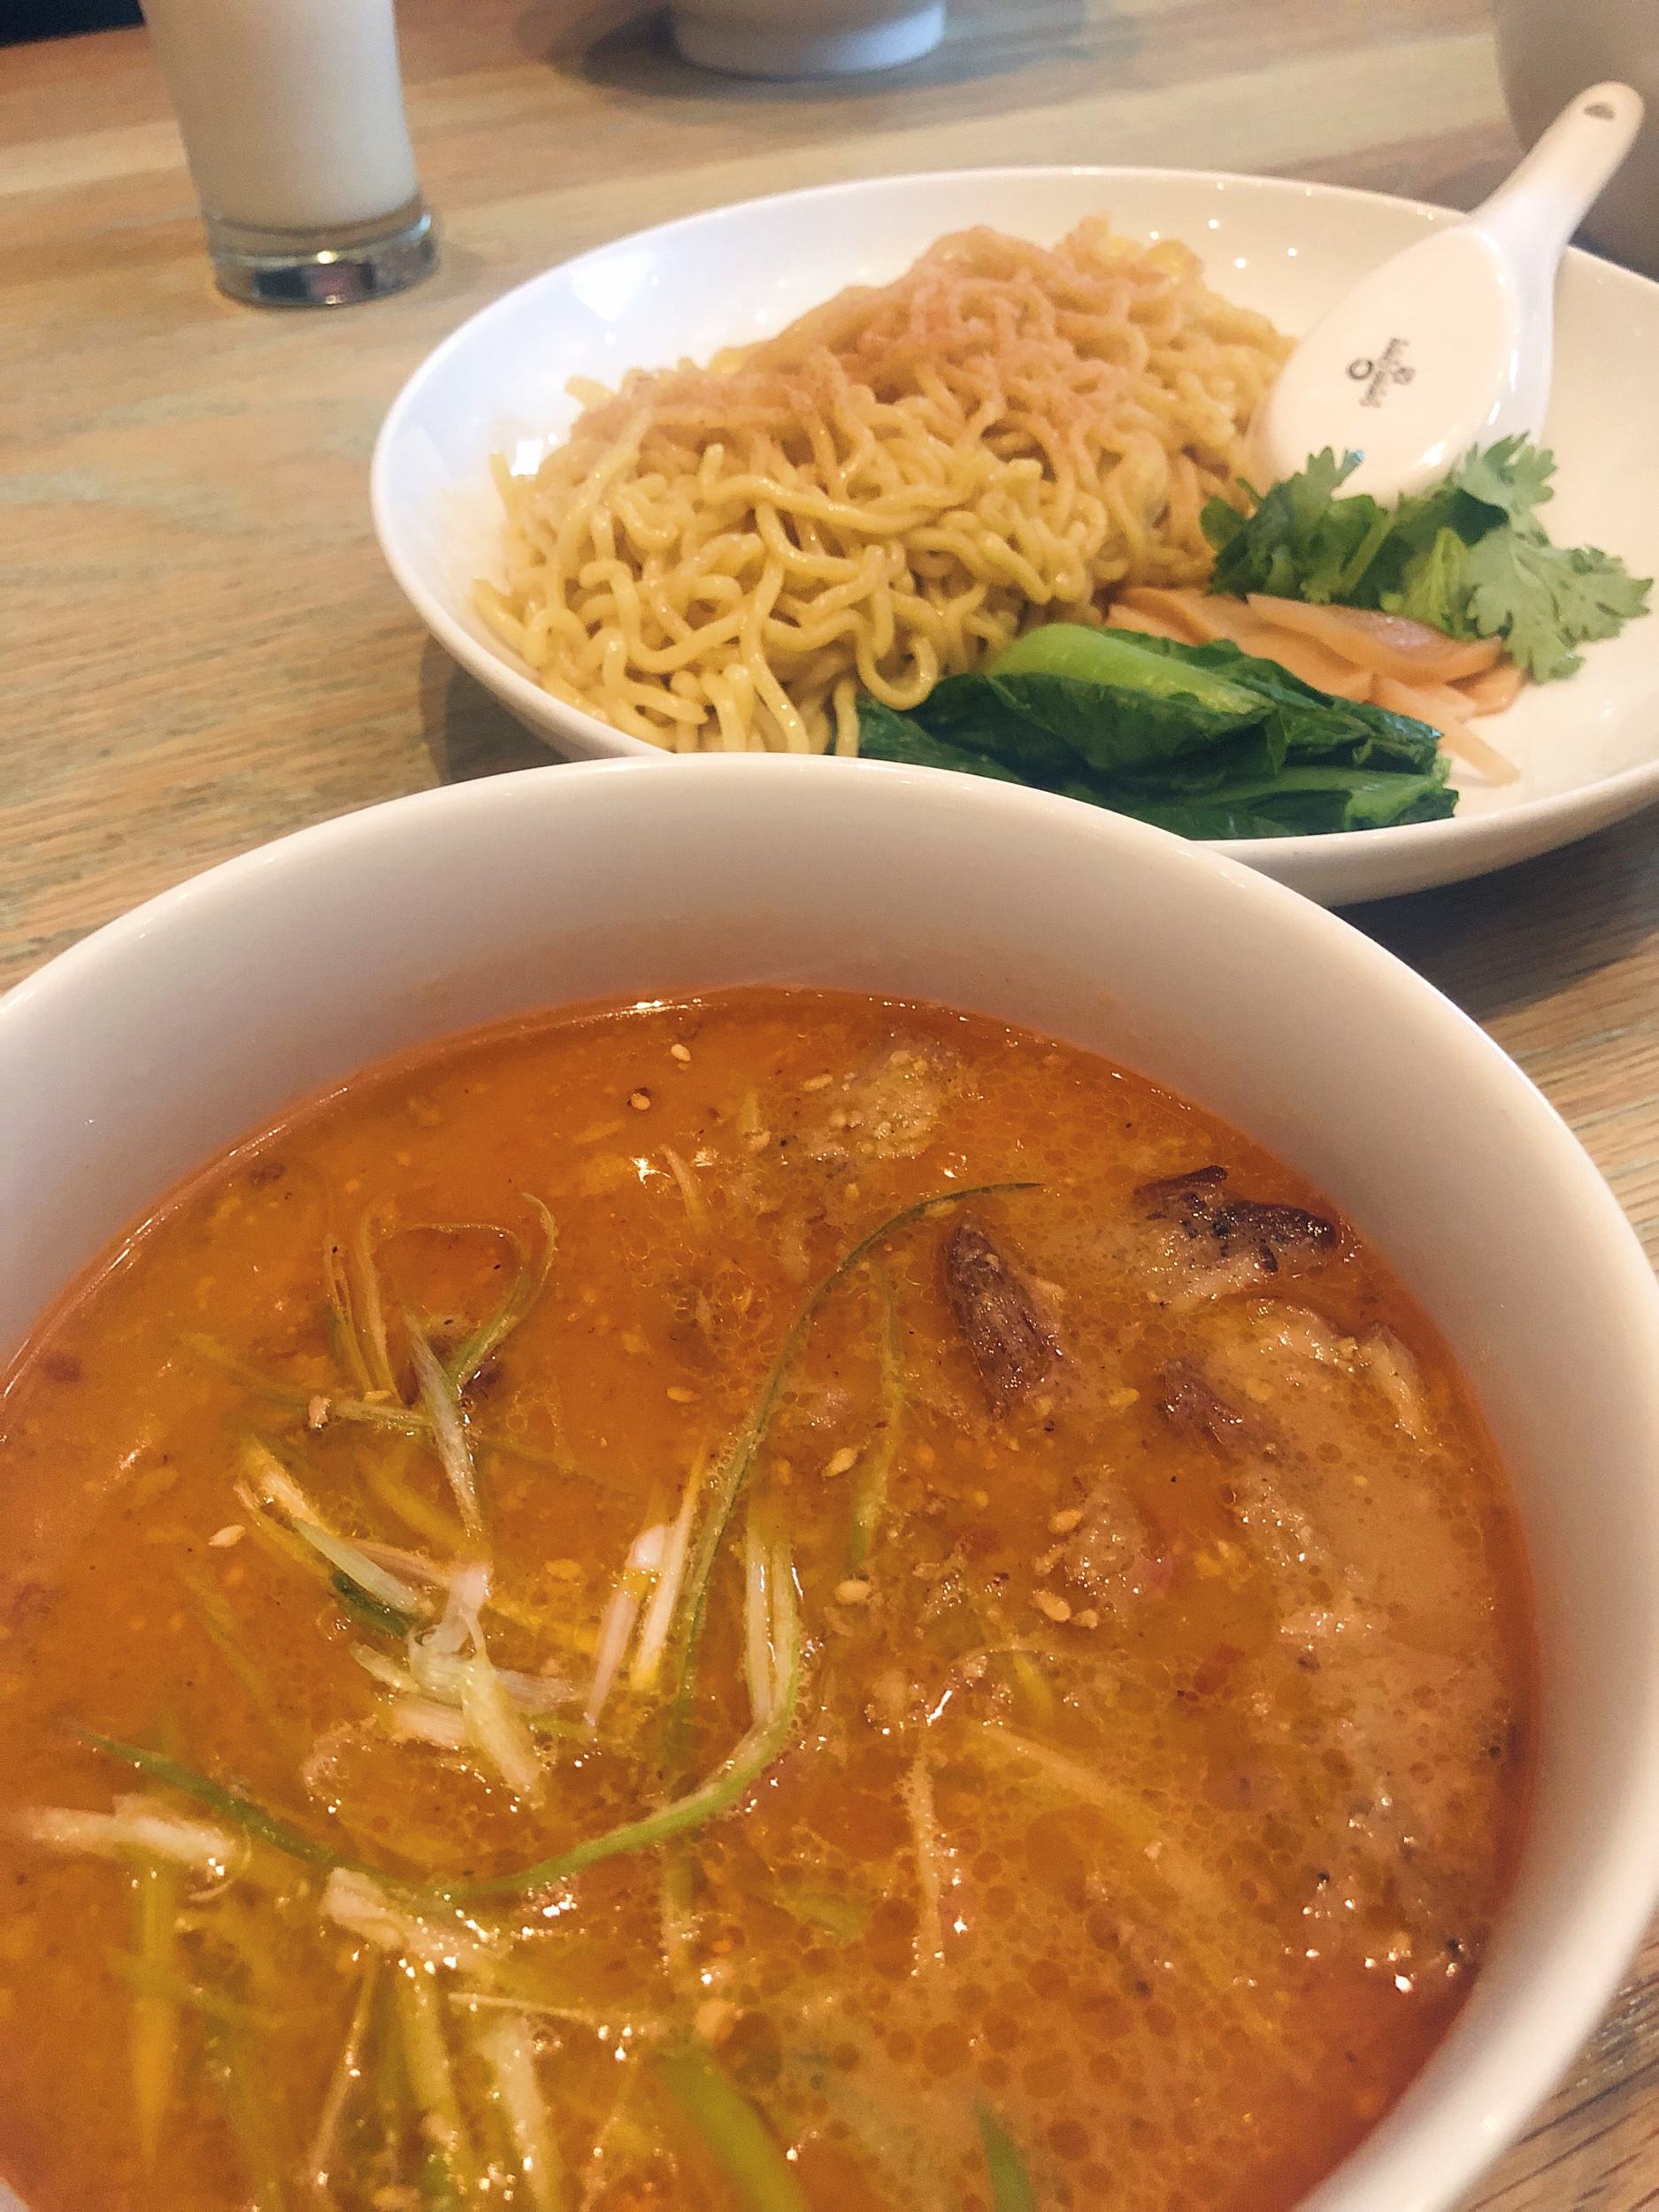 TSUKEMEN noodles for dipping from Momofuku